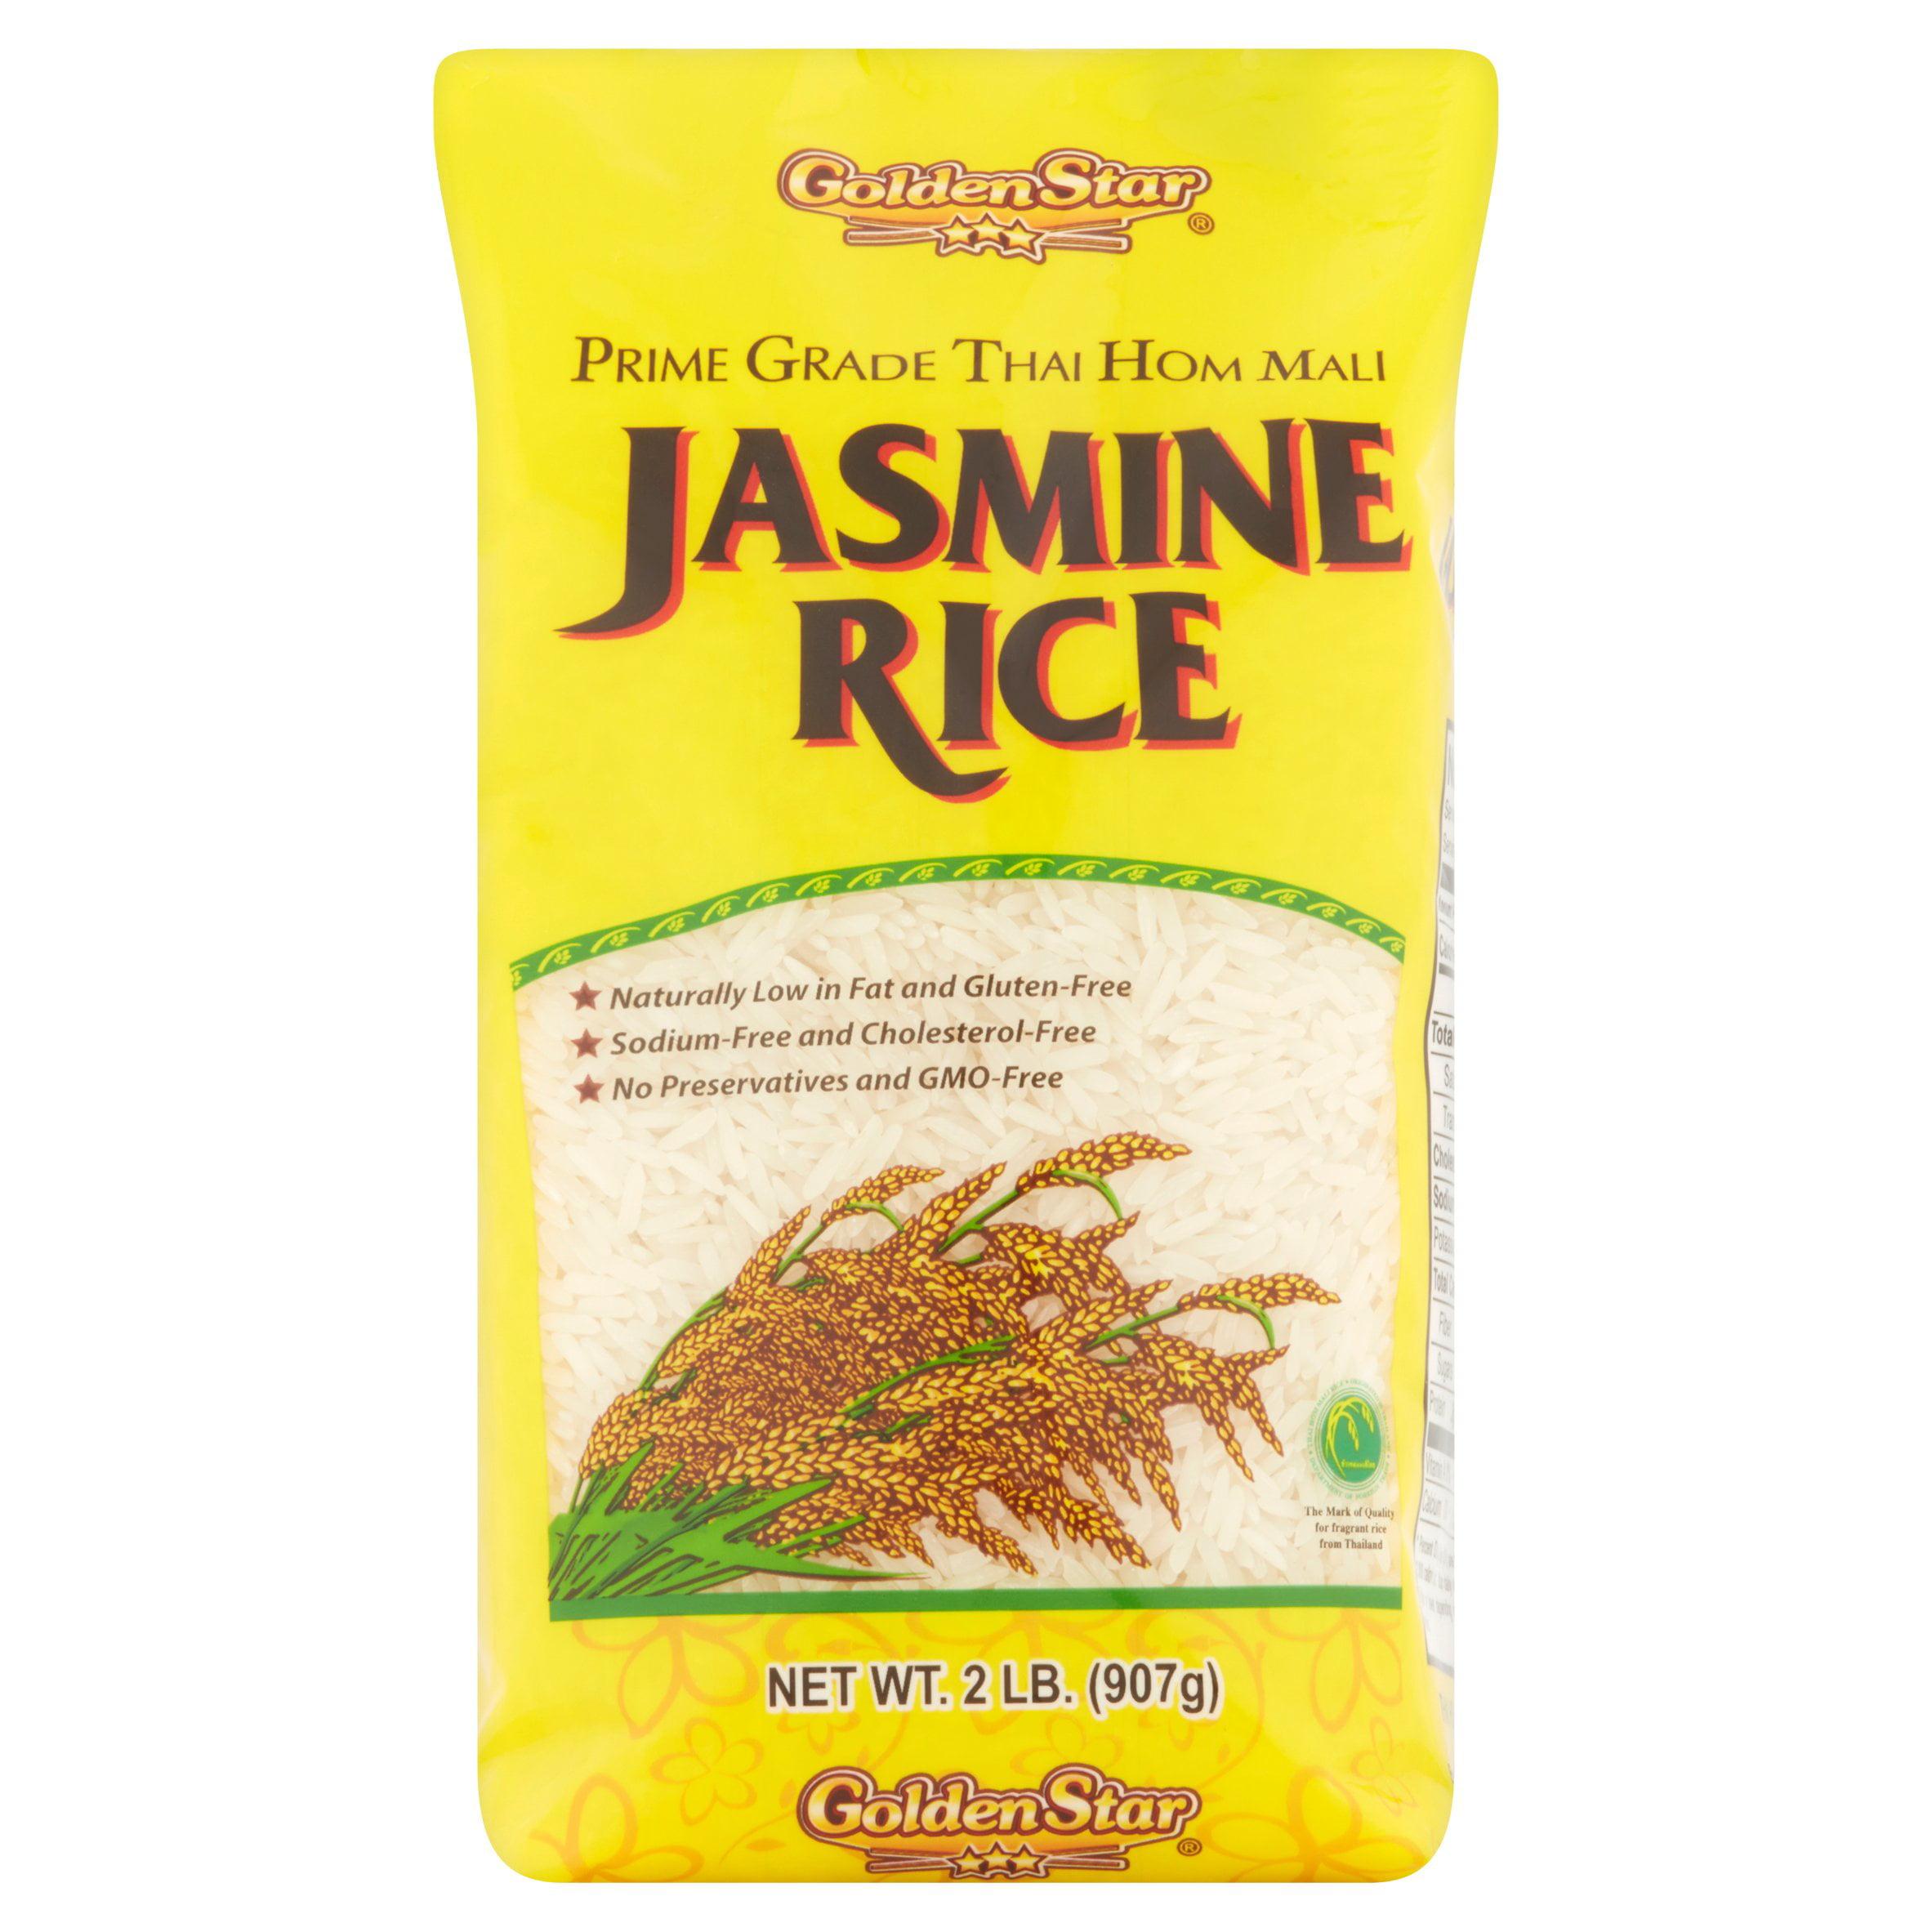 Golden Star Jasmine Rice, 2 lbs by Golden Star Trading, Inc.